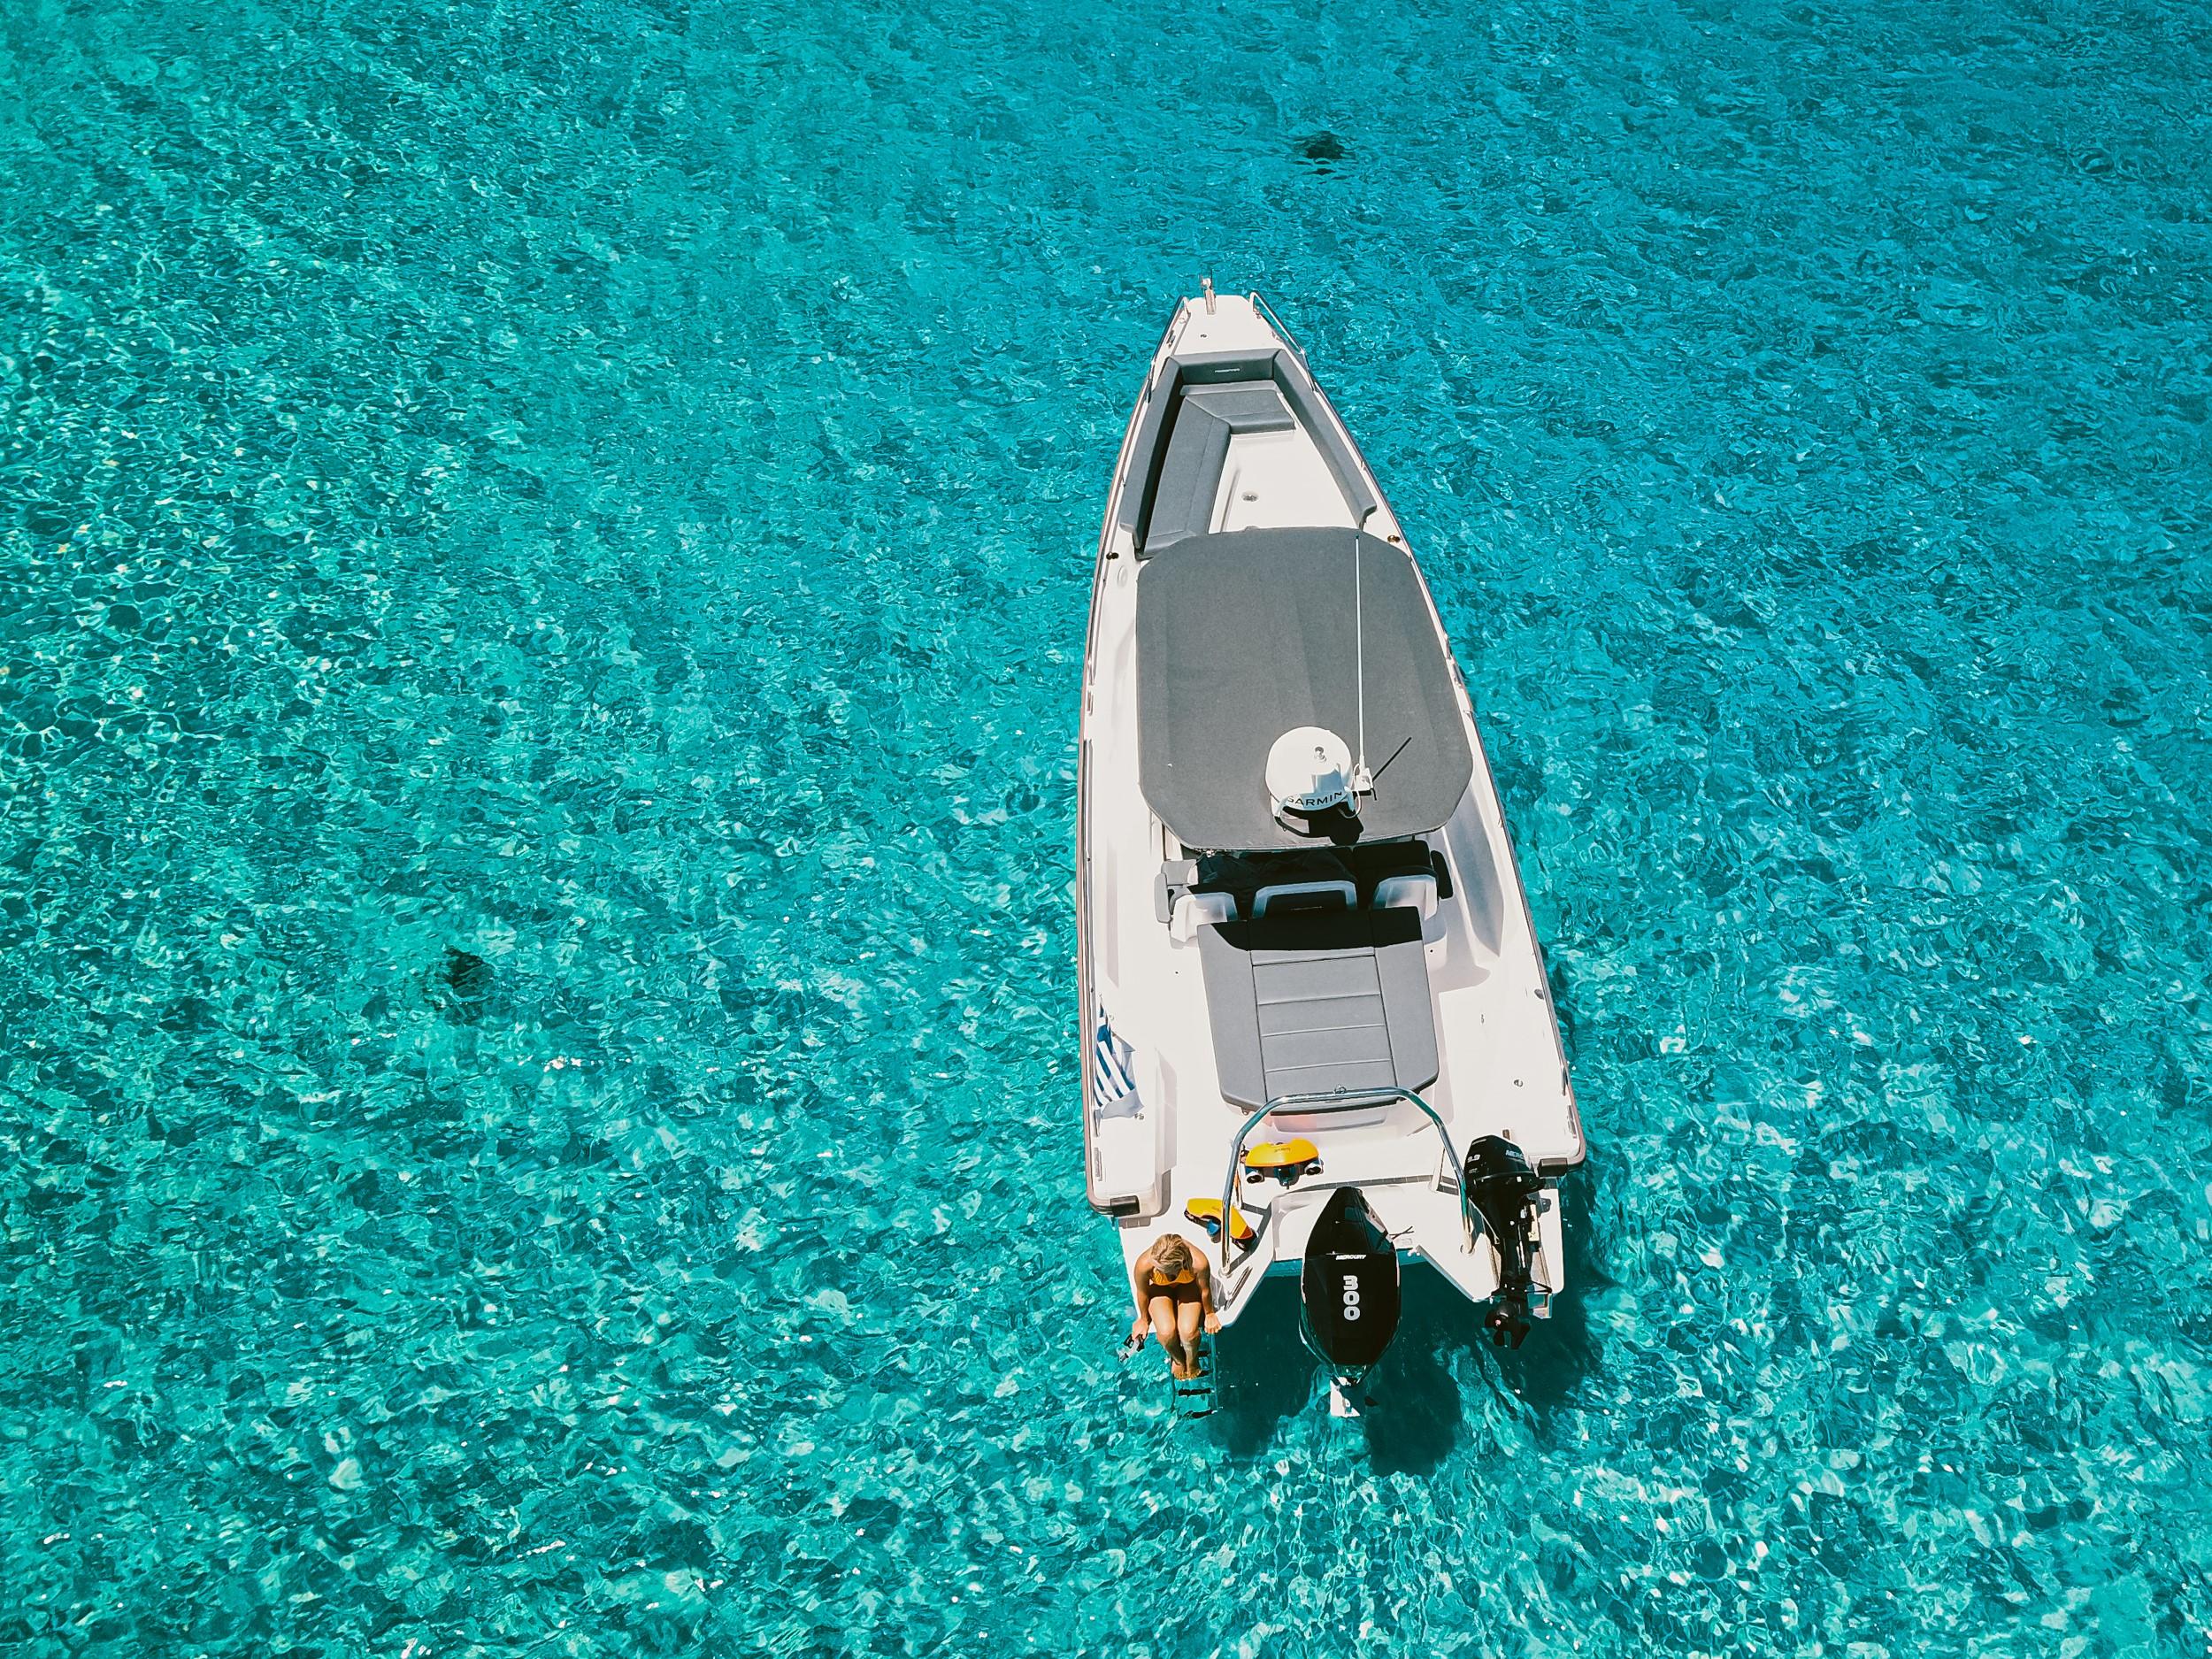 flisvos sportclub naxos griechenland wassersport urlaub ferien sommer axopar 28 TT seasecret boat trip divescooter